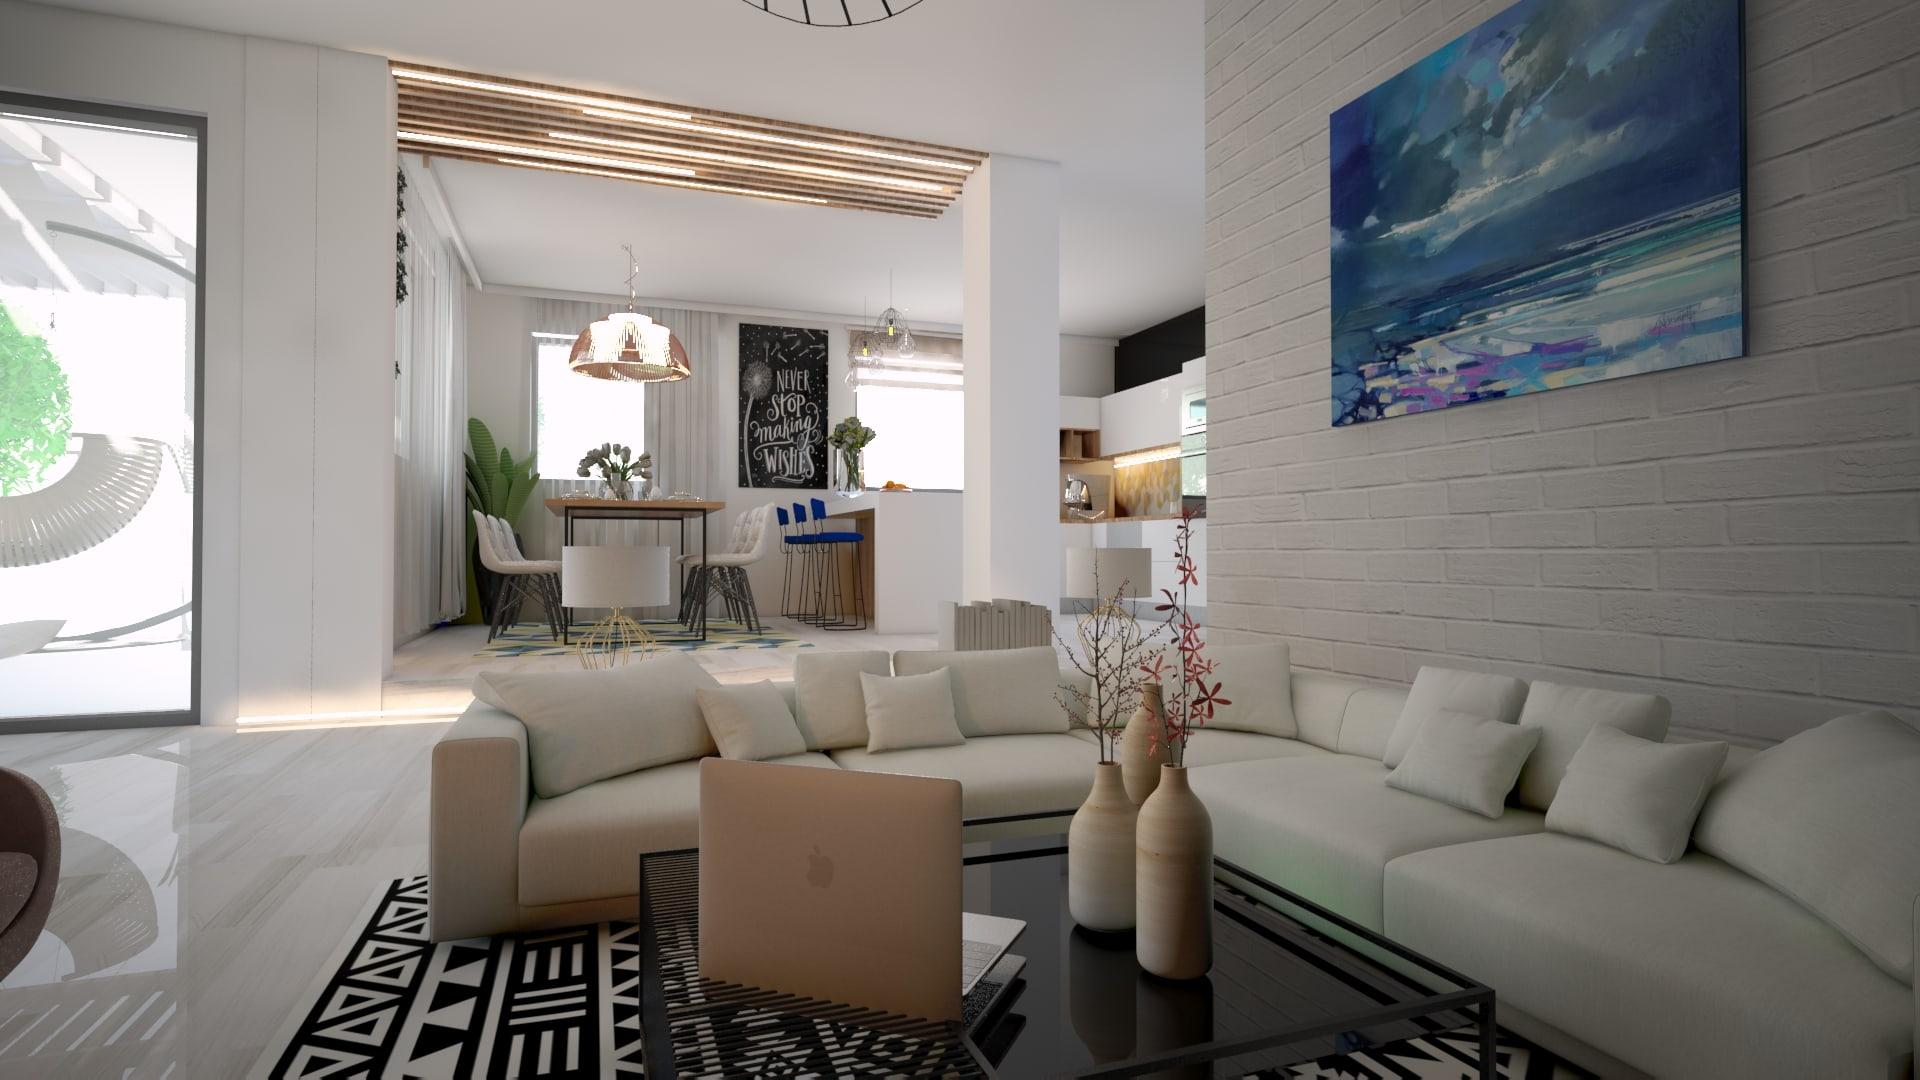 amenajare interioara living room modern